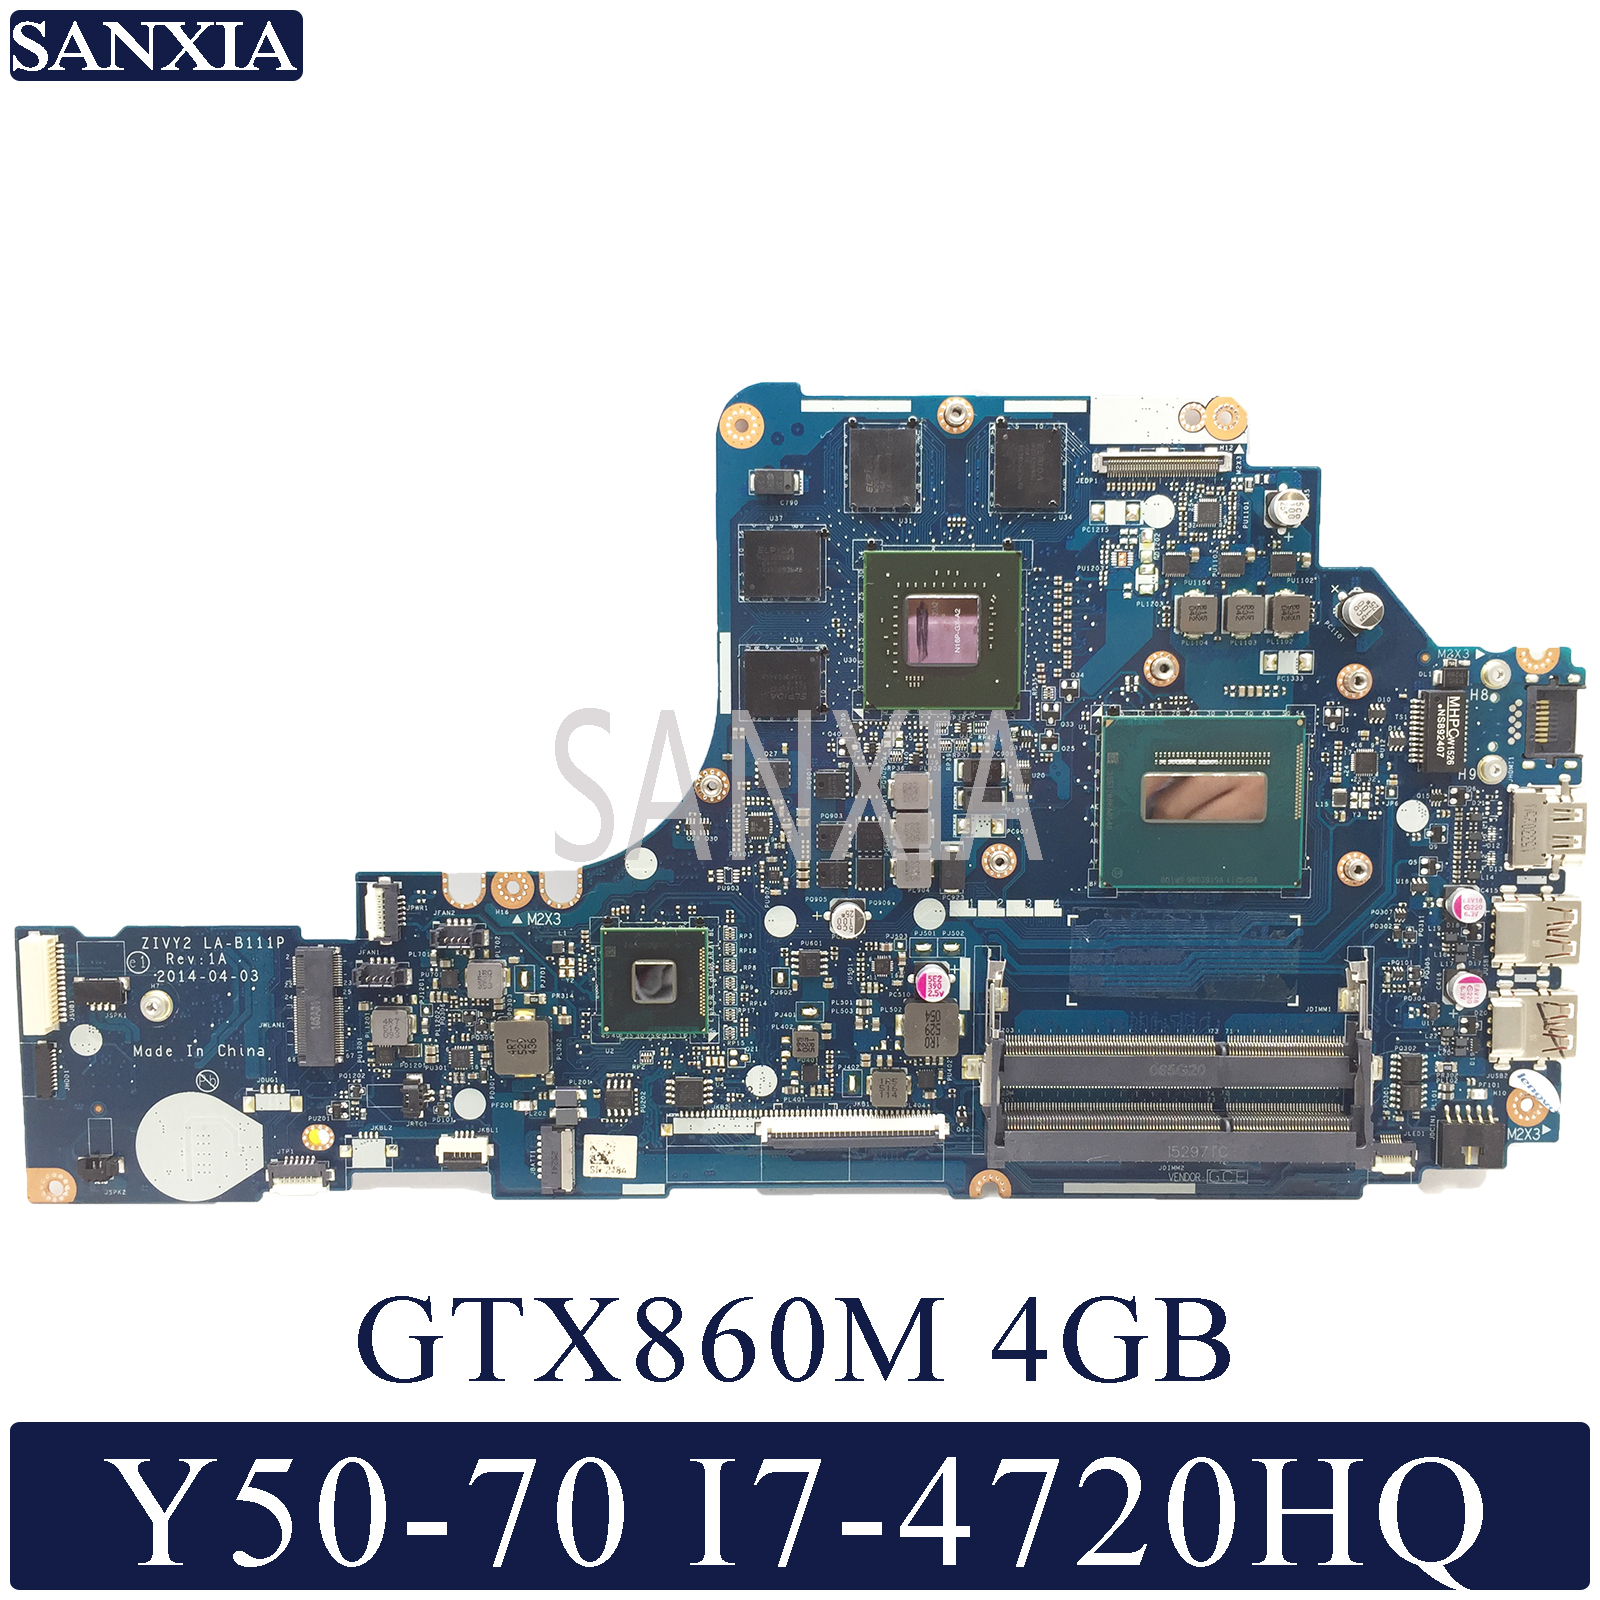 KEFU LA-B111P Laptop Motherboard For Lenovo Y50-70 Original Mainboard I7-4720HQ/4710HQ GTX860M-4GB